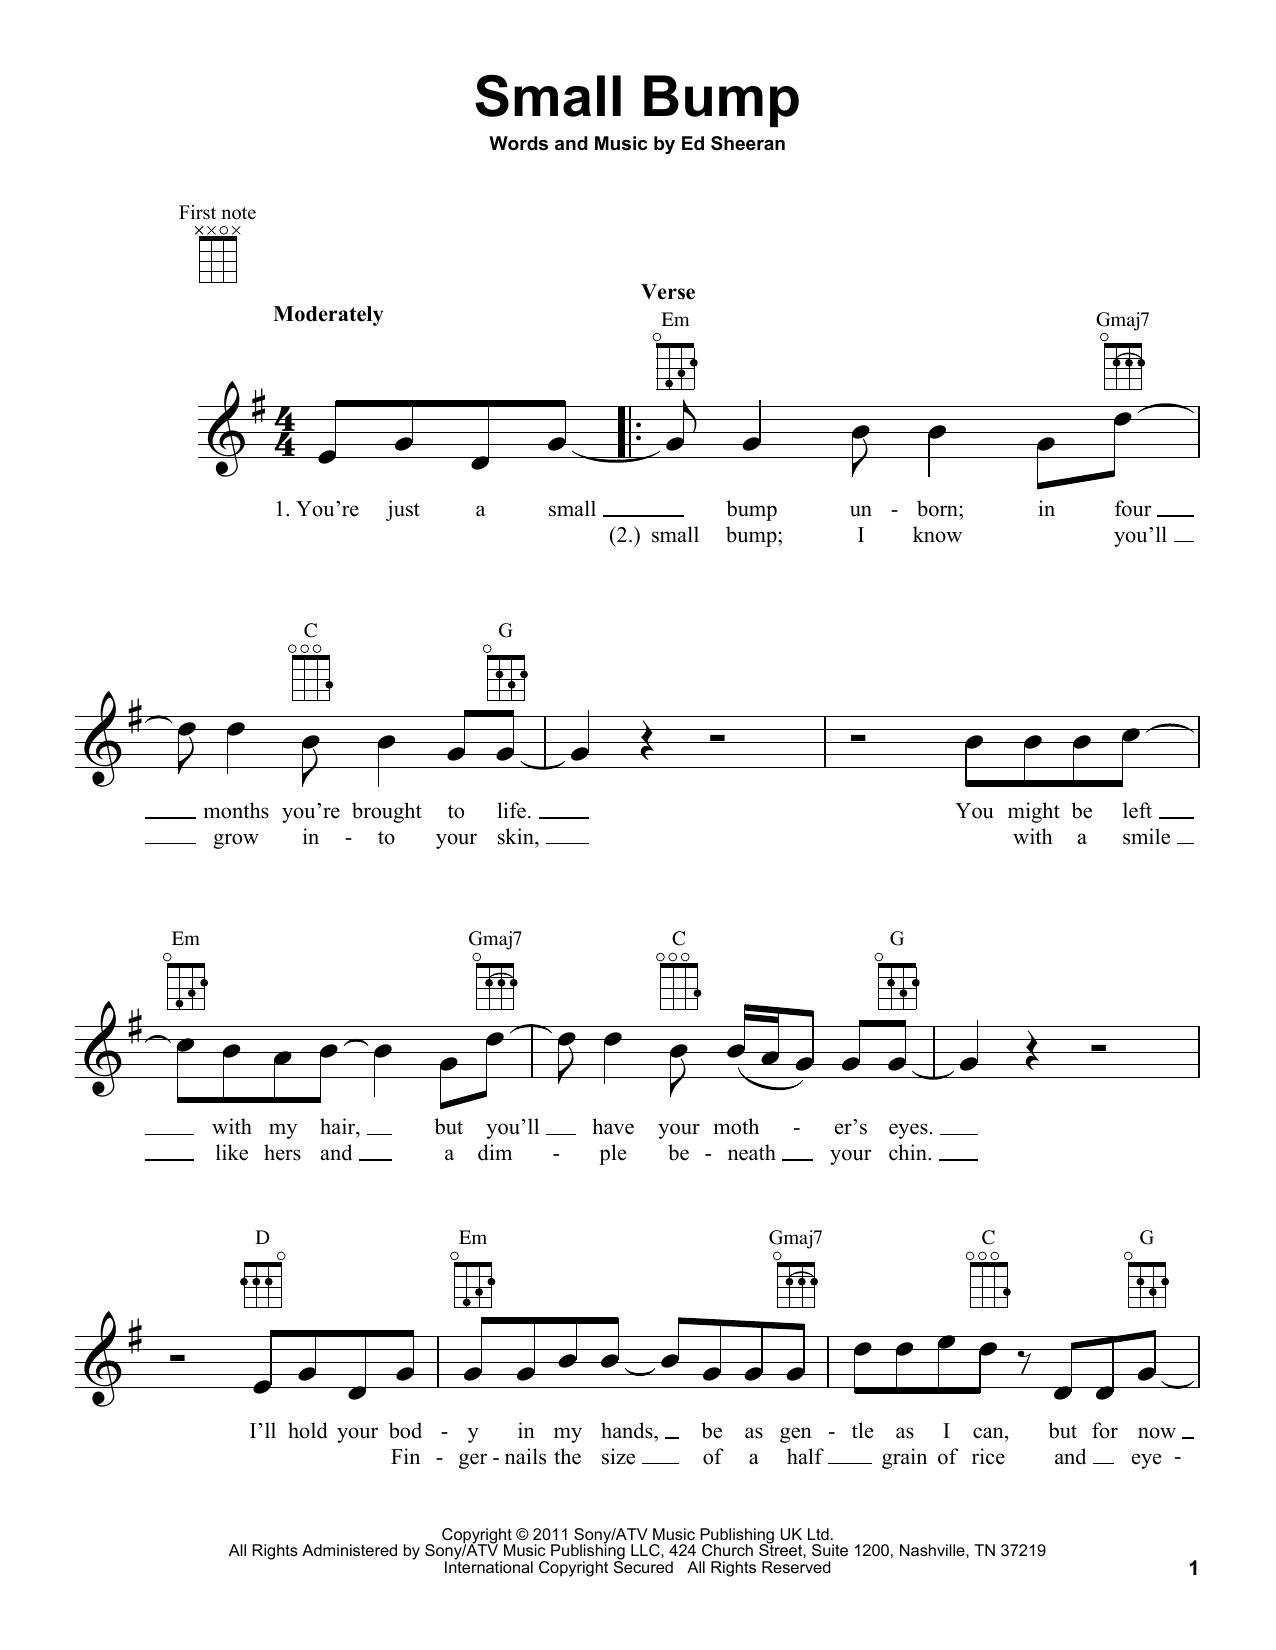 Small Bump Sheet Music